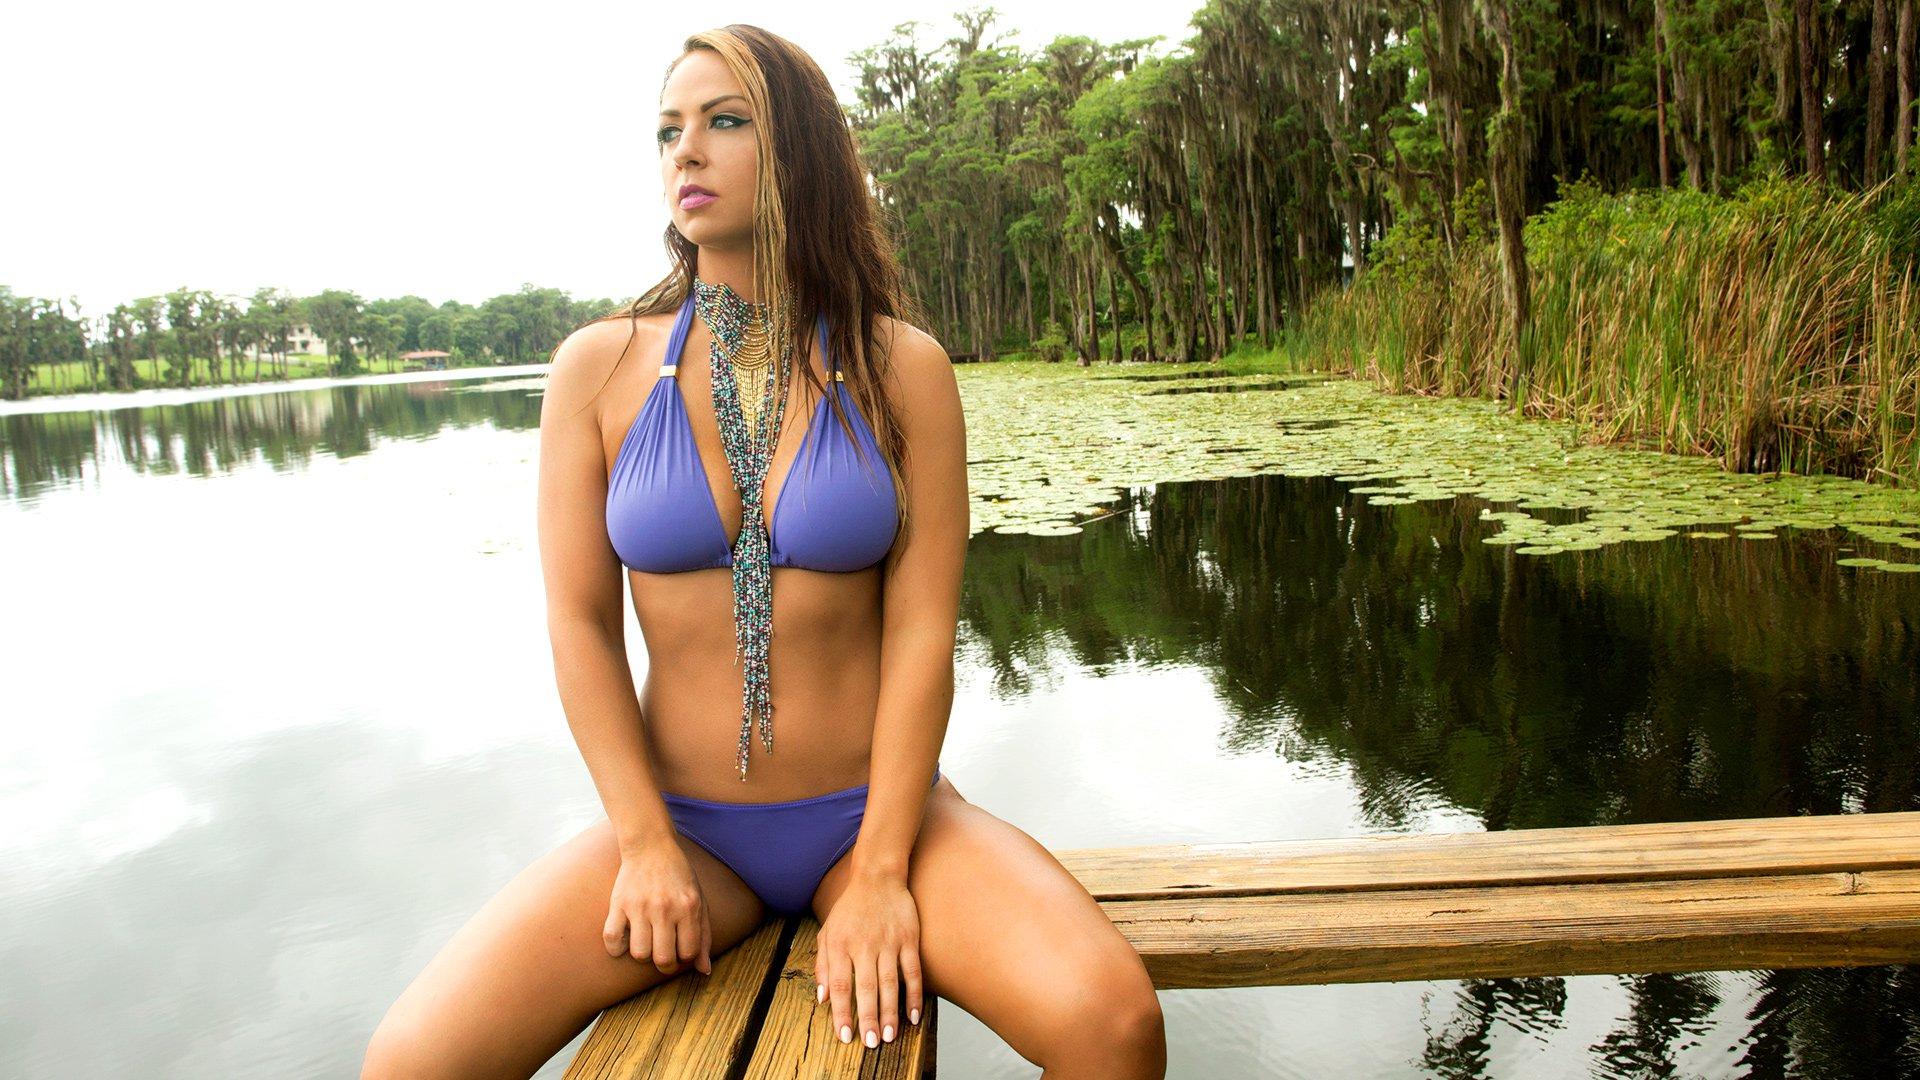 Emma's Beautiful Bikini Photos - WWE.com - Wrestling Forum ...